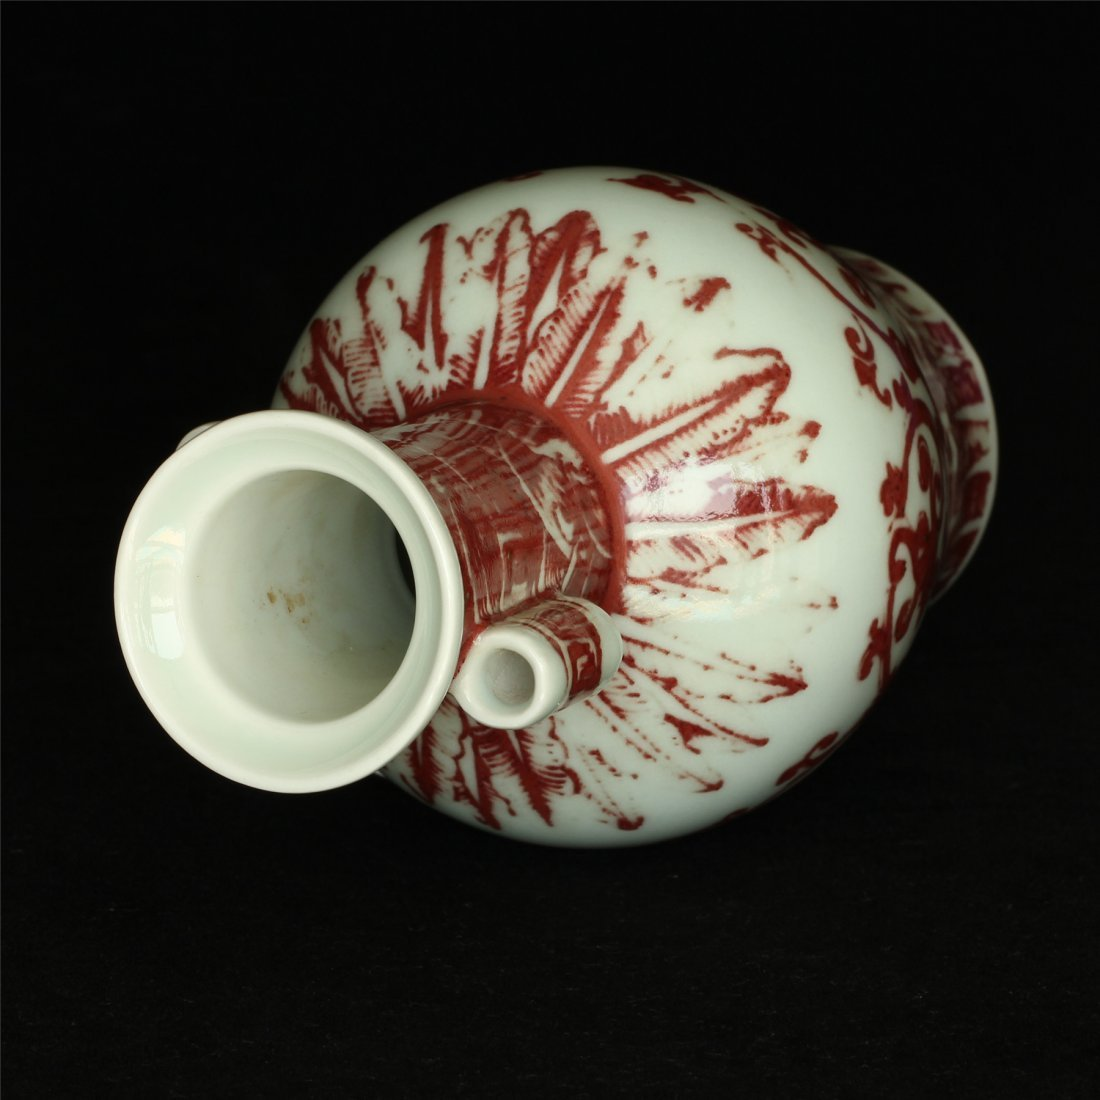 Underglaze red porcelain vase of Qing Dynasty QianLong - 5